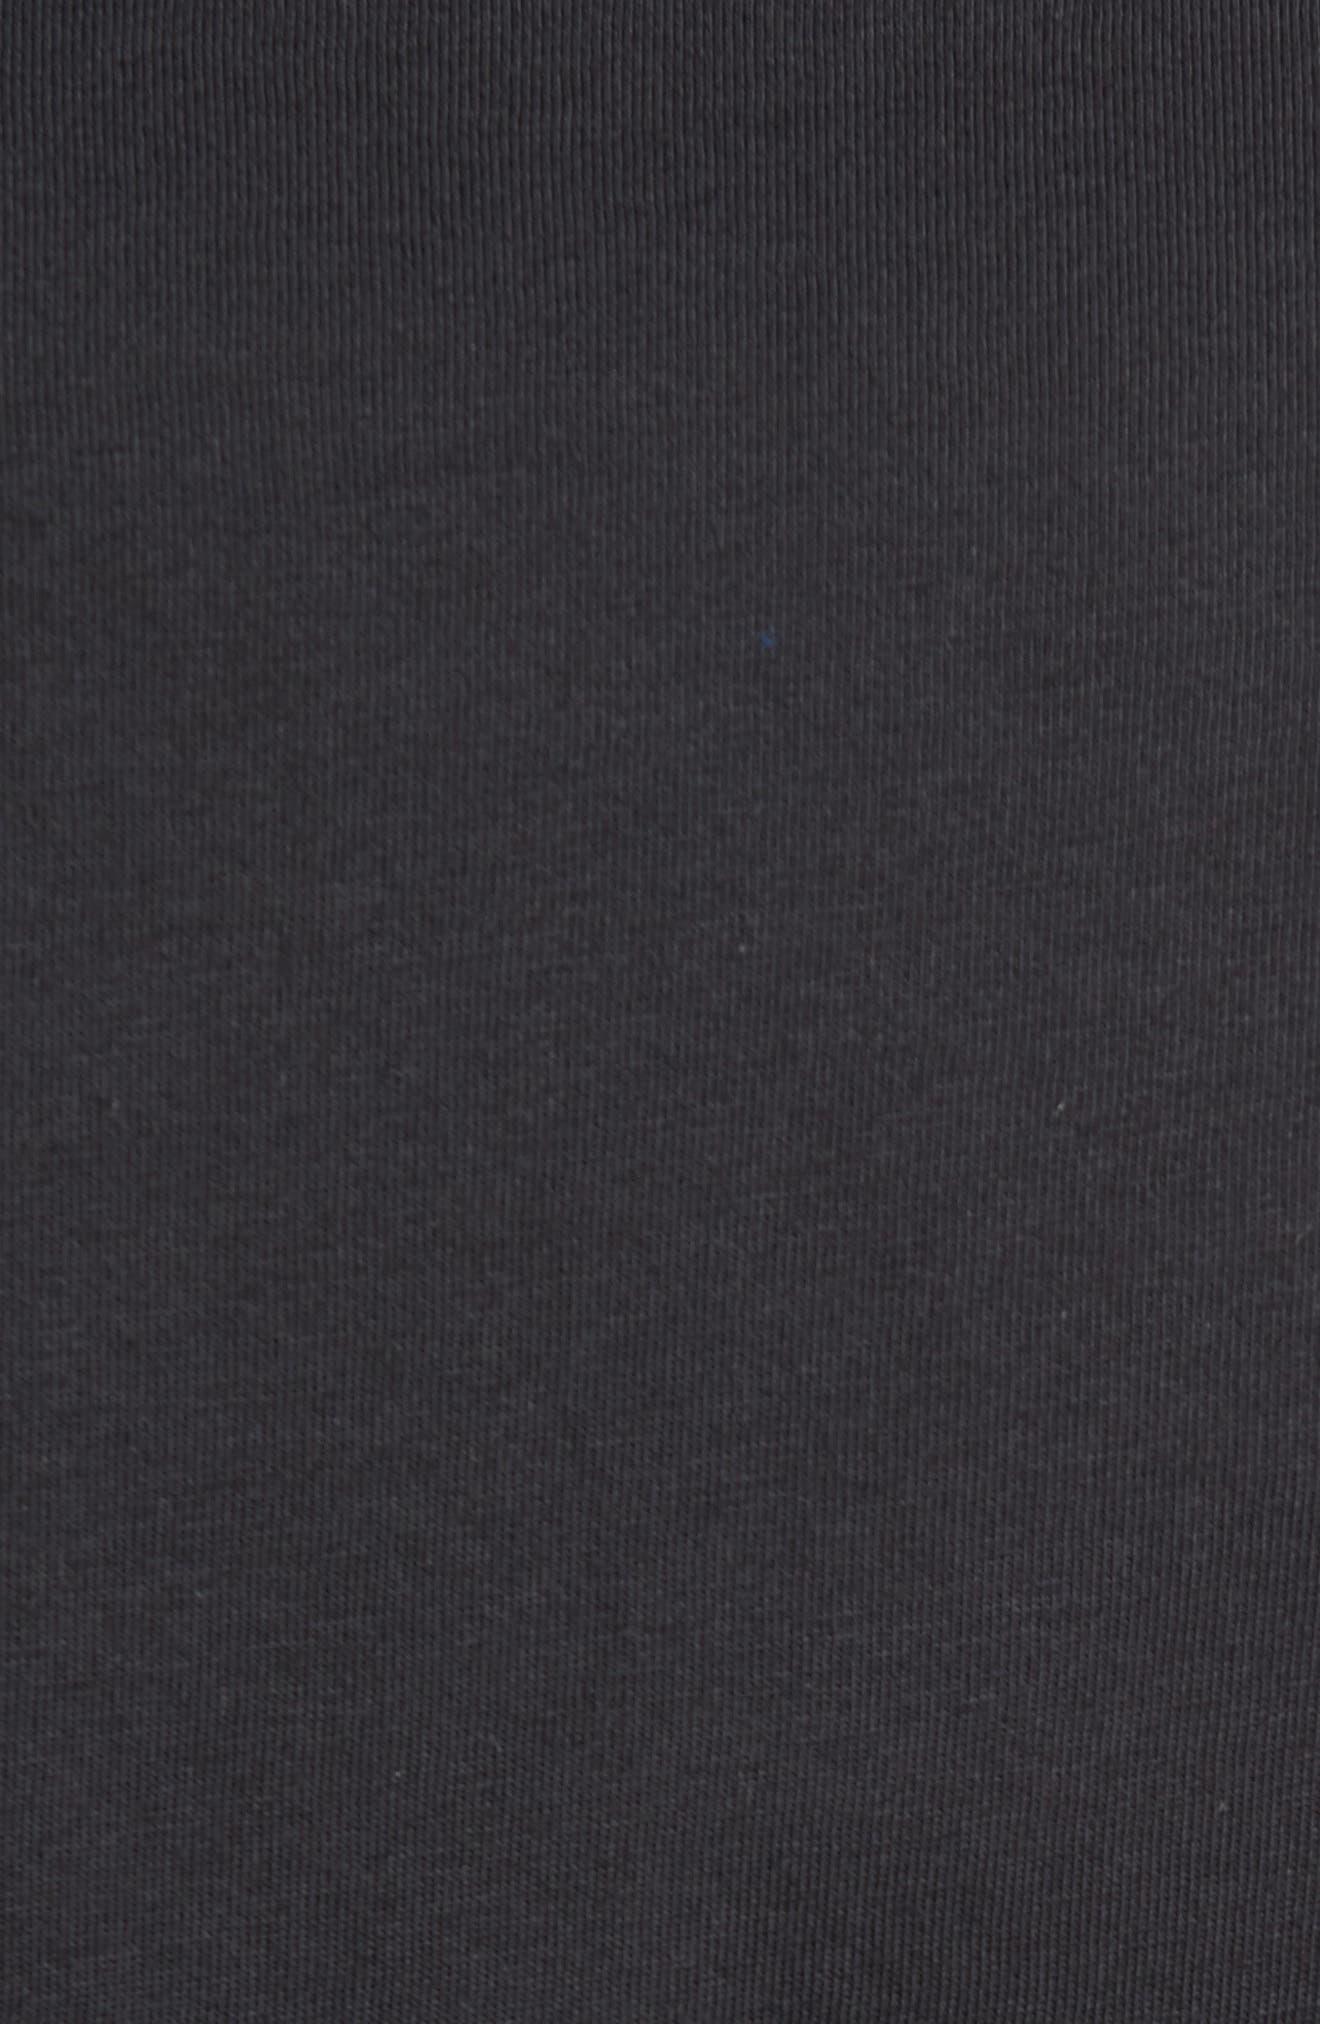 Trefoil Graphic T-Shirt,                             Alternate thumbnail 5, color,                             Black